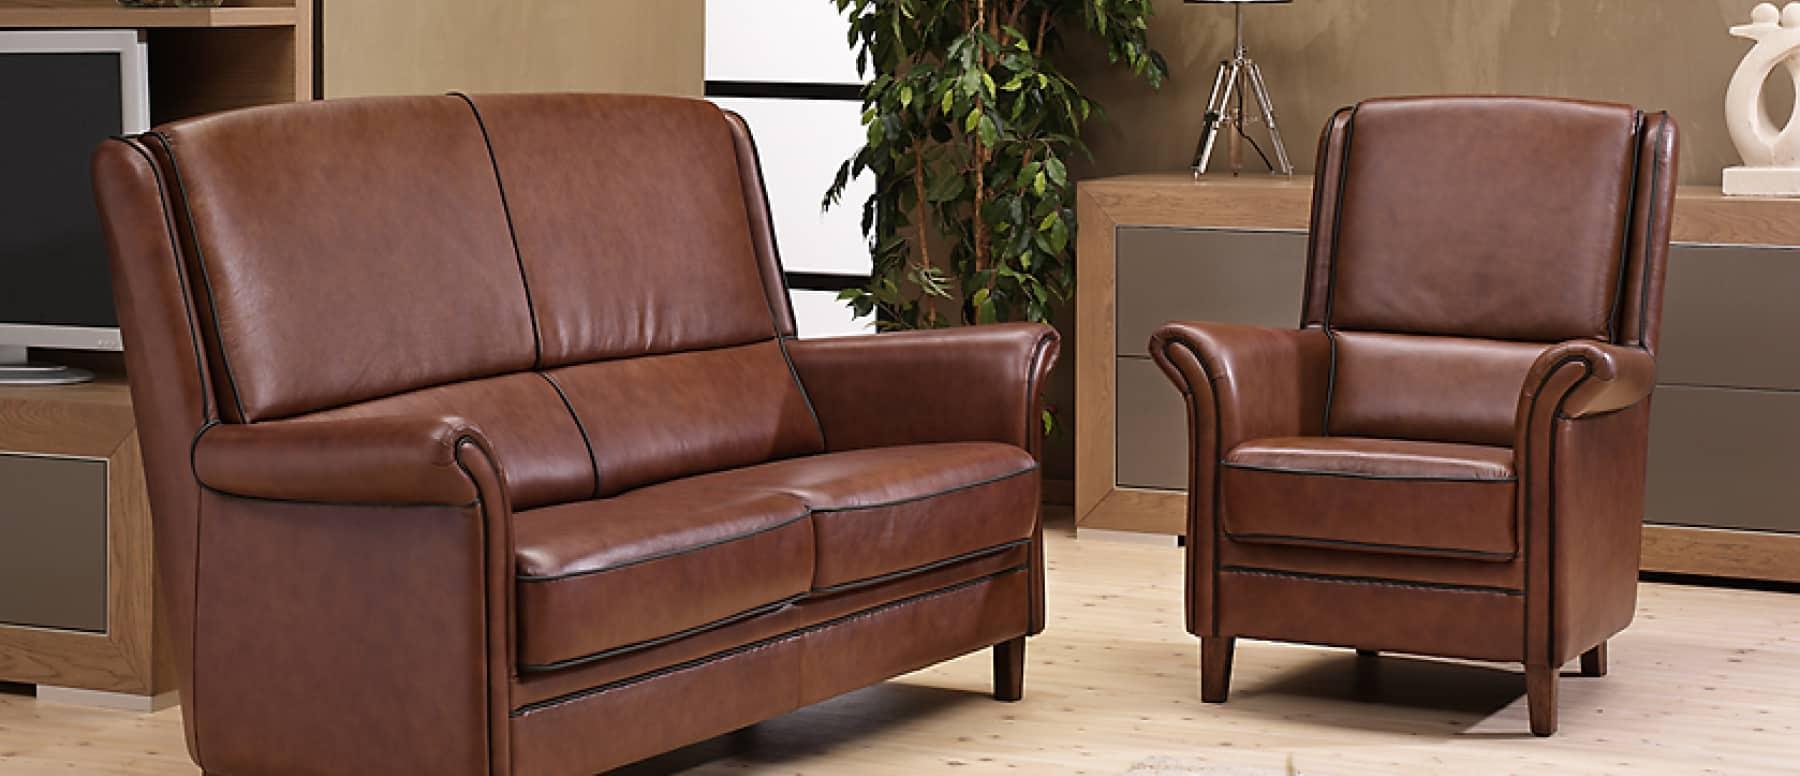 DN design meubelen 1